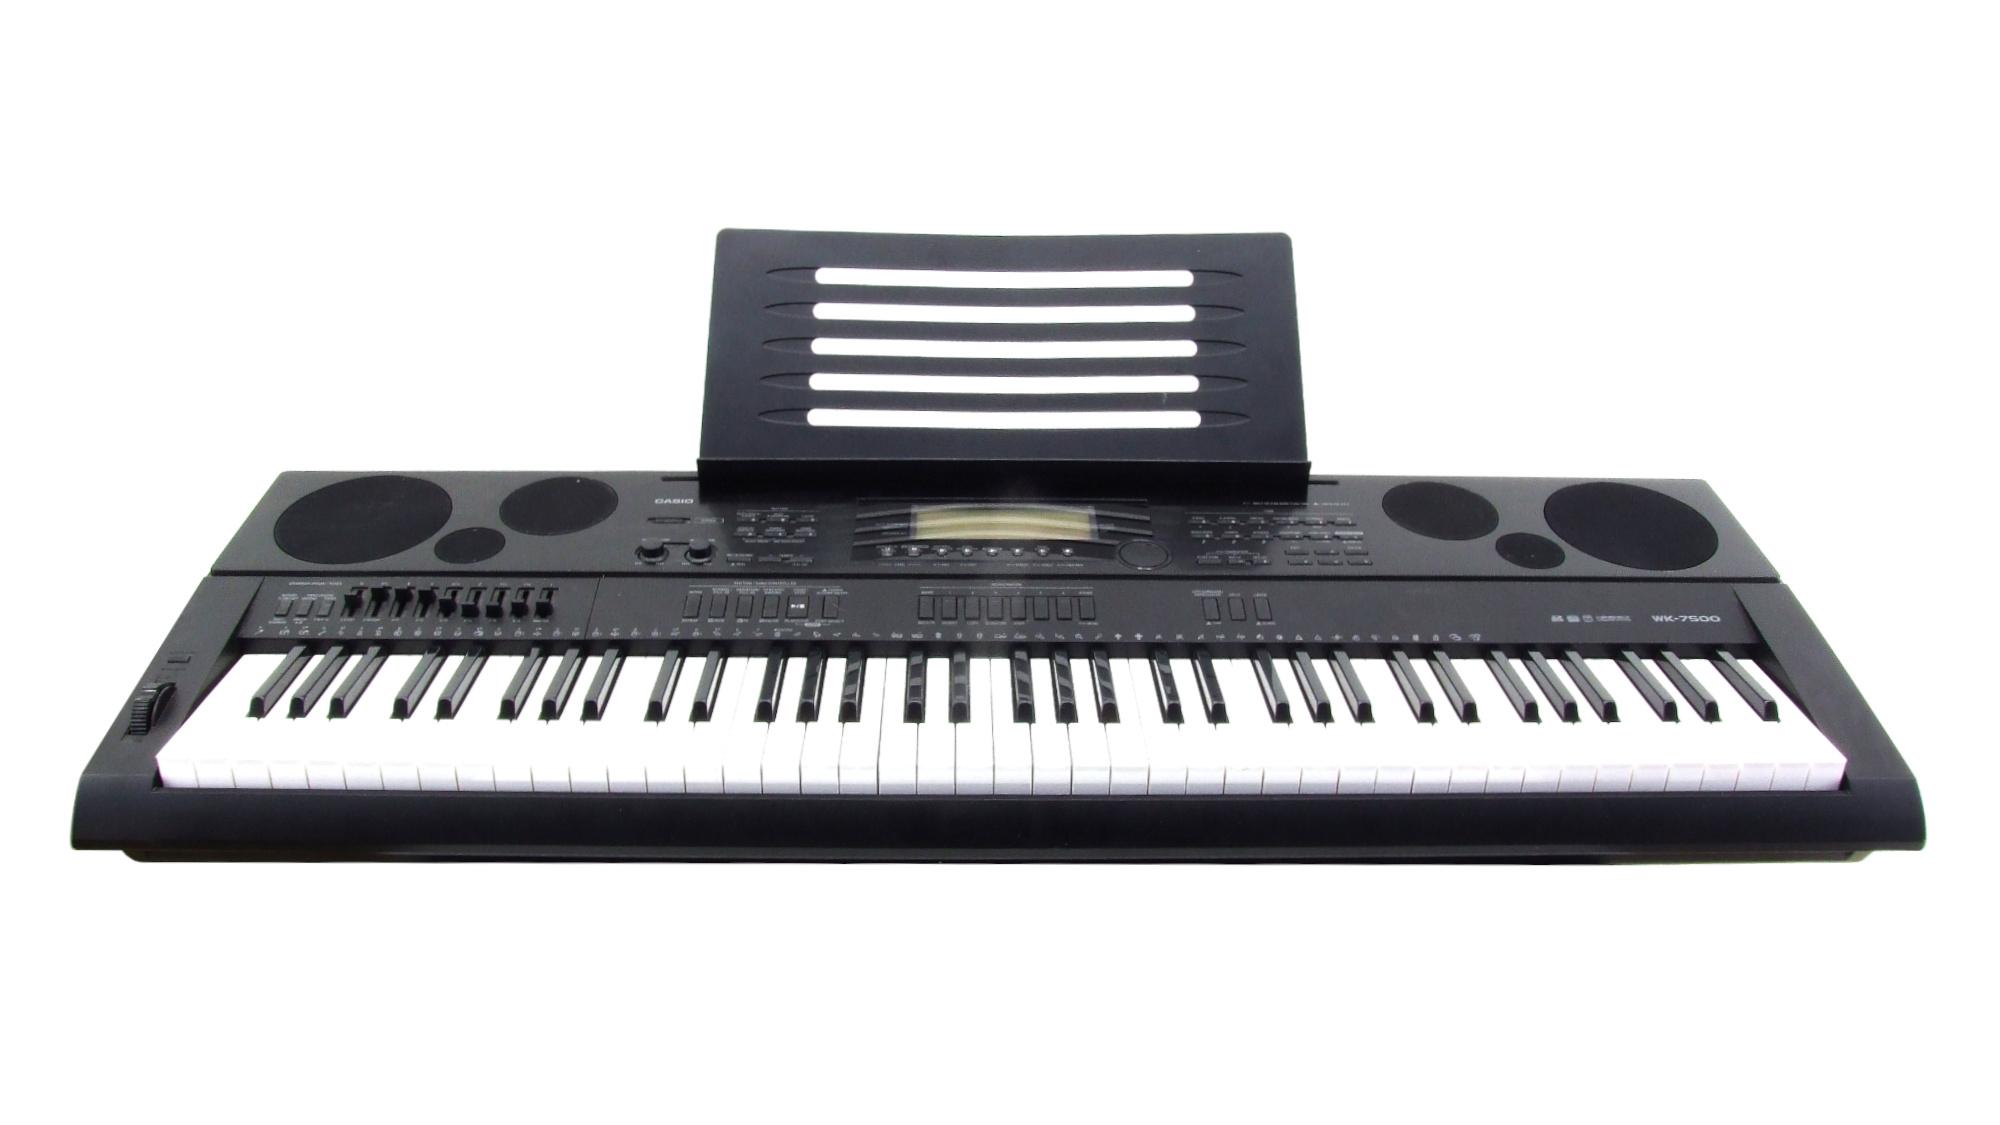 Casio WK-7500 Keyboard leihen